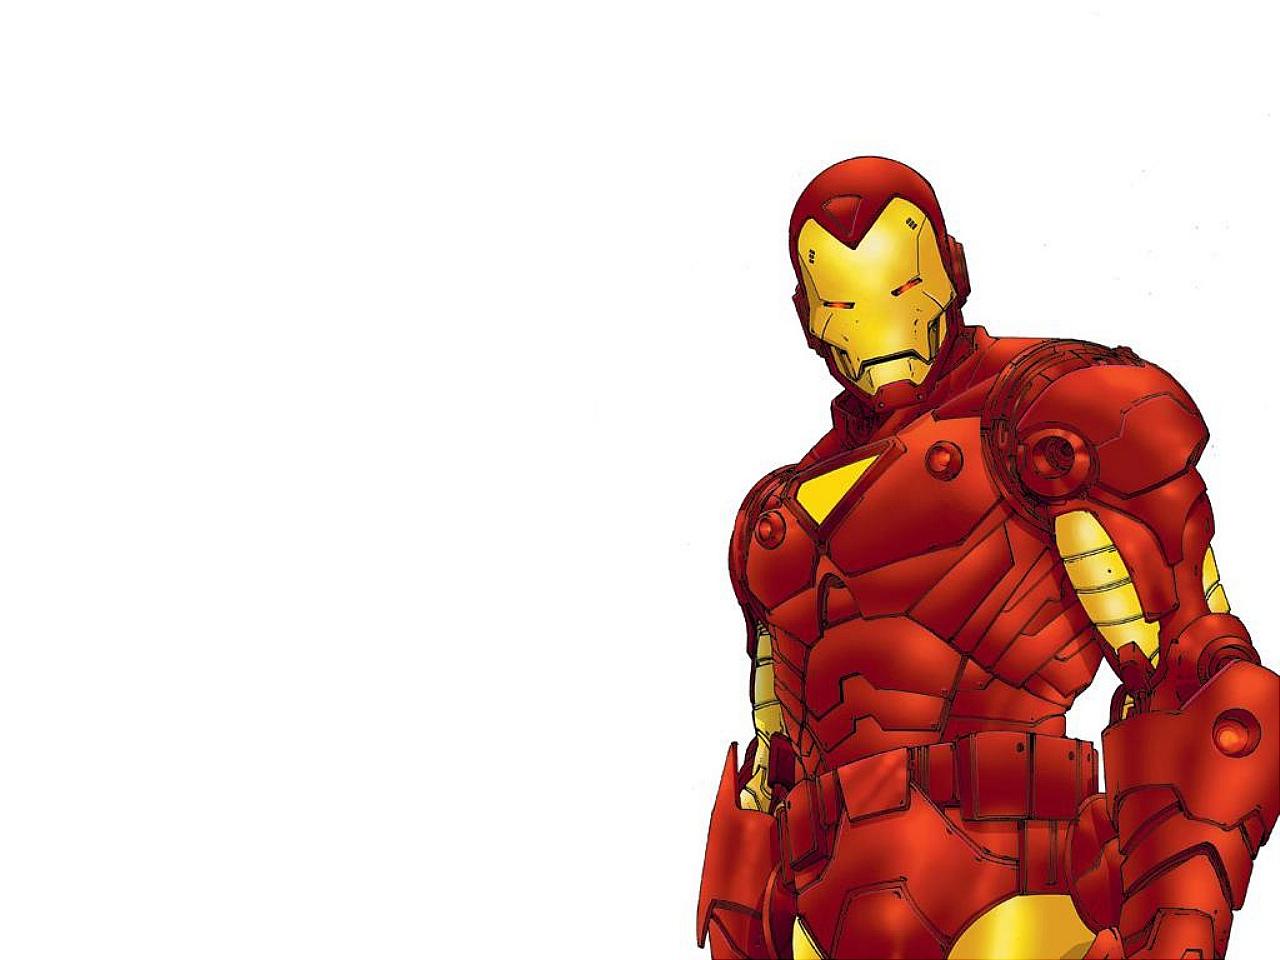 Sketch wallpaper wallpapersafari - Iron man cartoon download ...